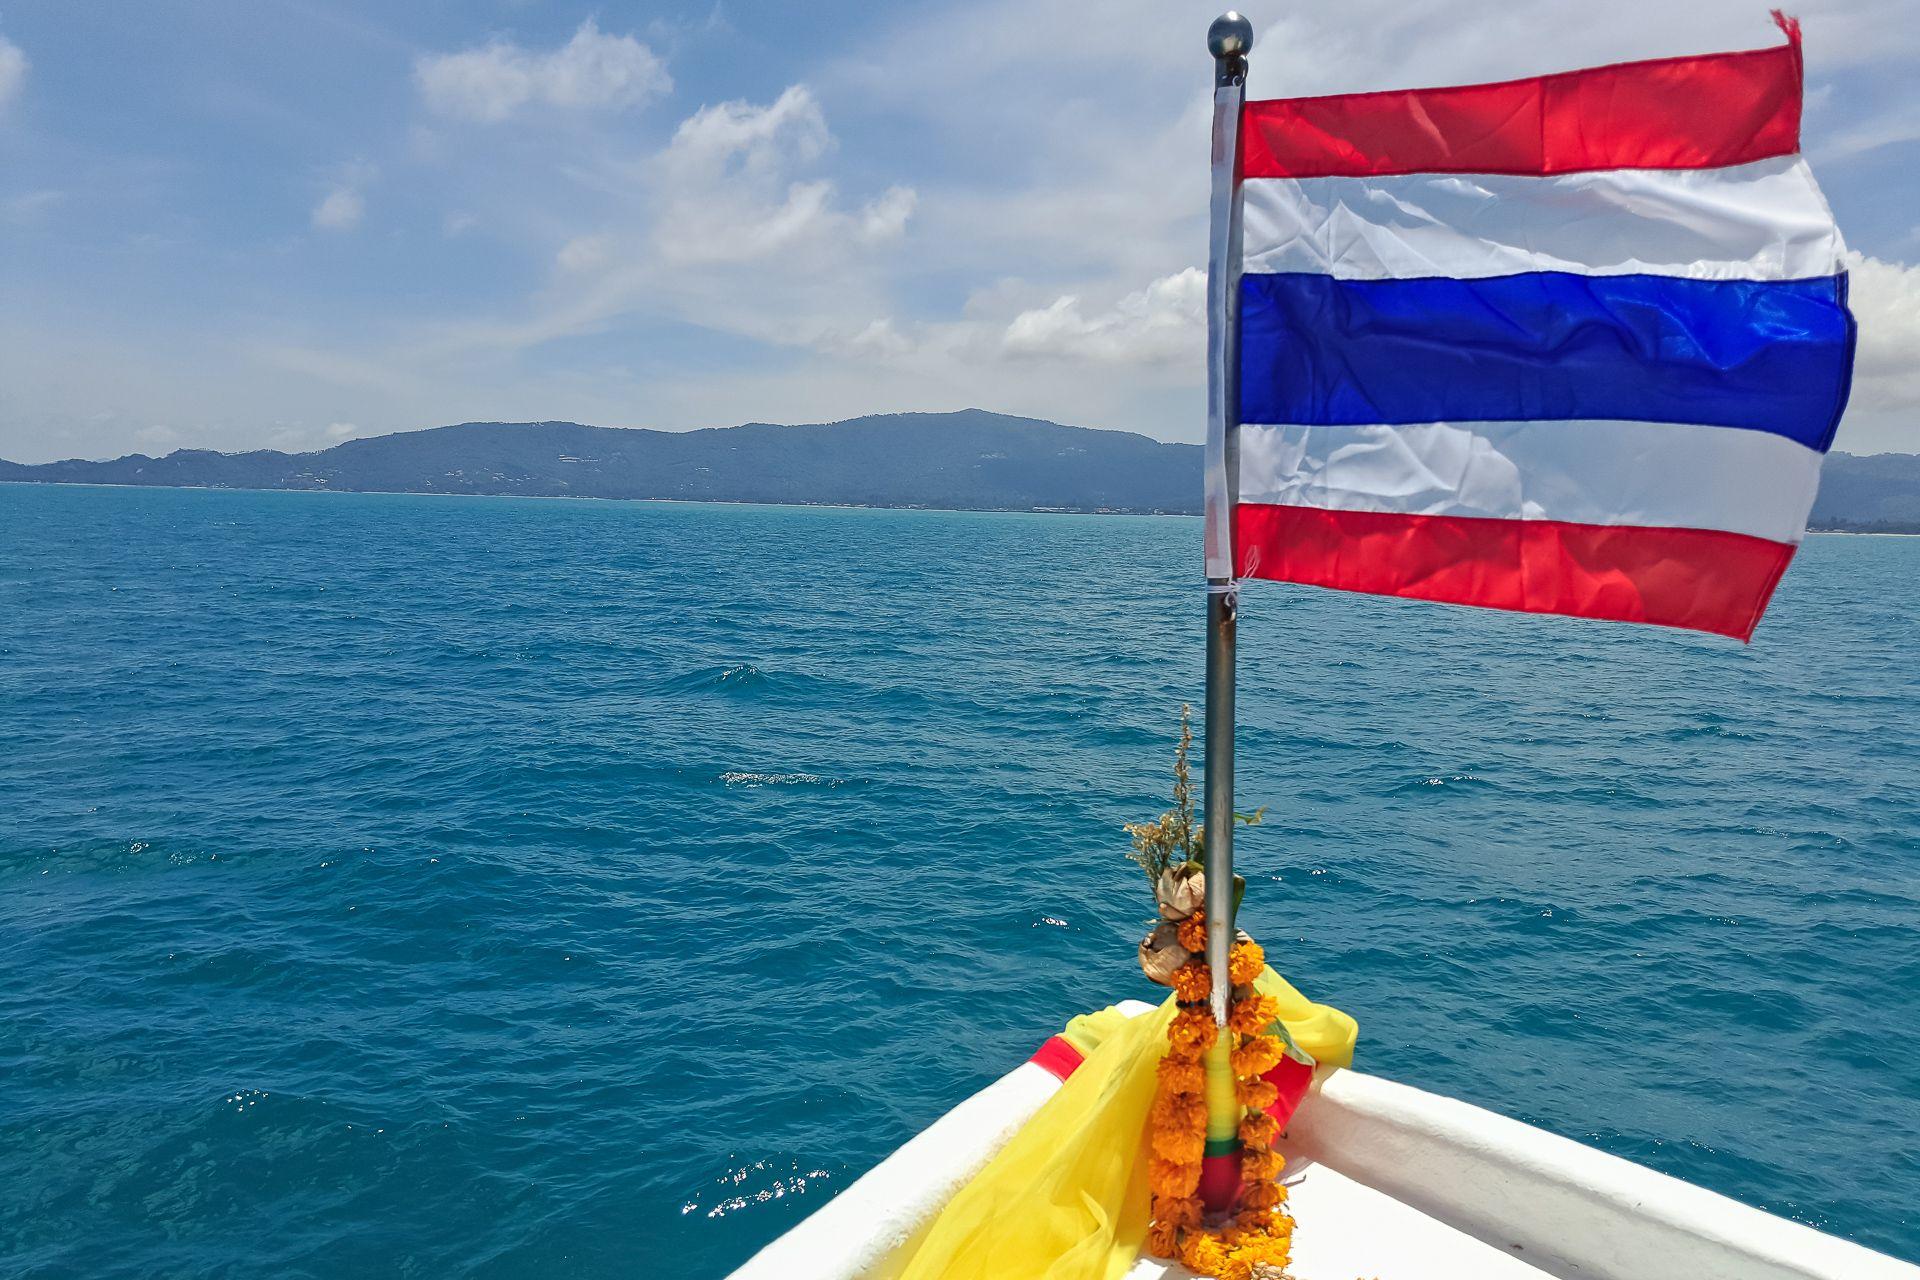 Thailand, flag, sae, Samui, ferry, visa, флаг, флаг Таиланда, тайский флаг, море, паром, остров , Самуи, виза, тайская виза